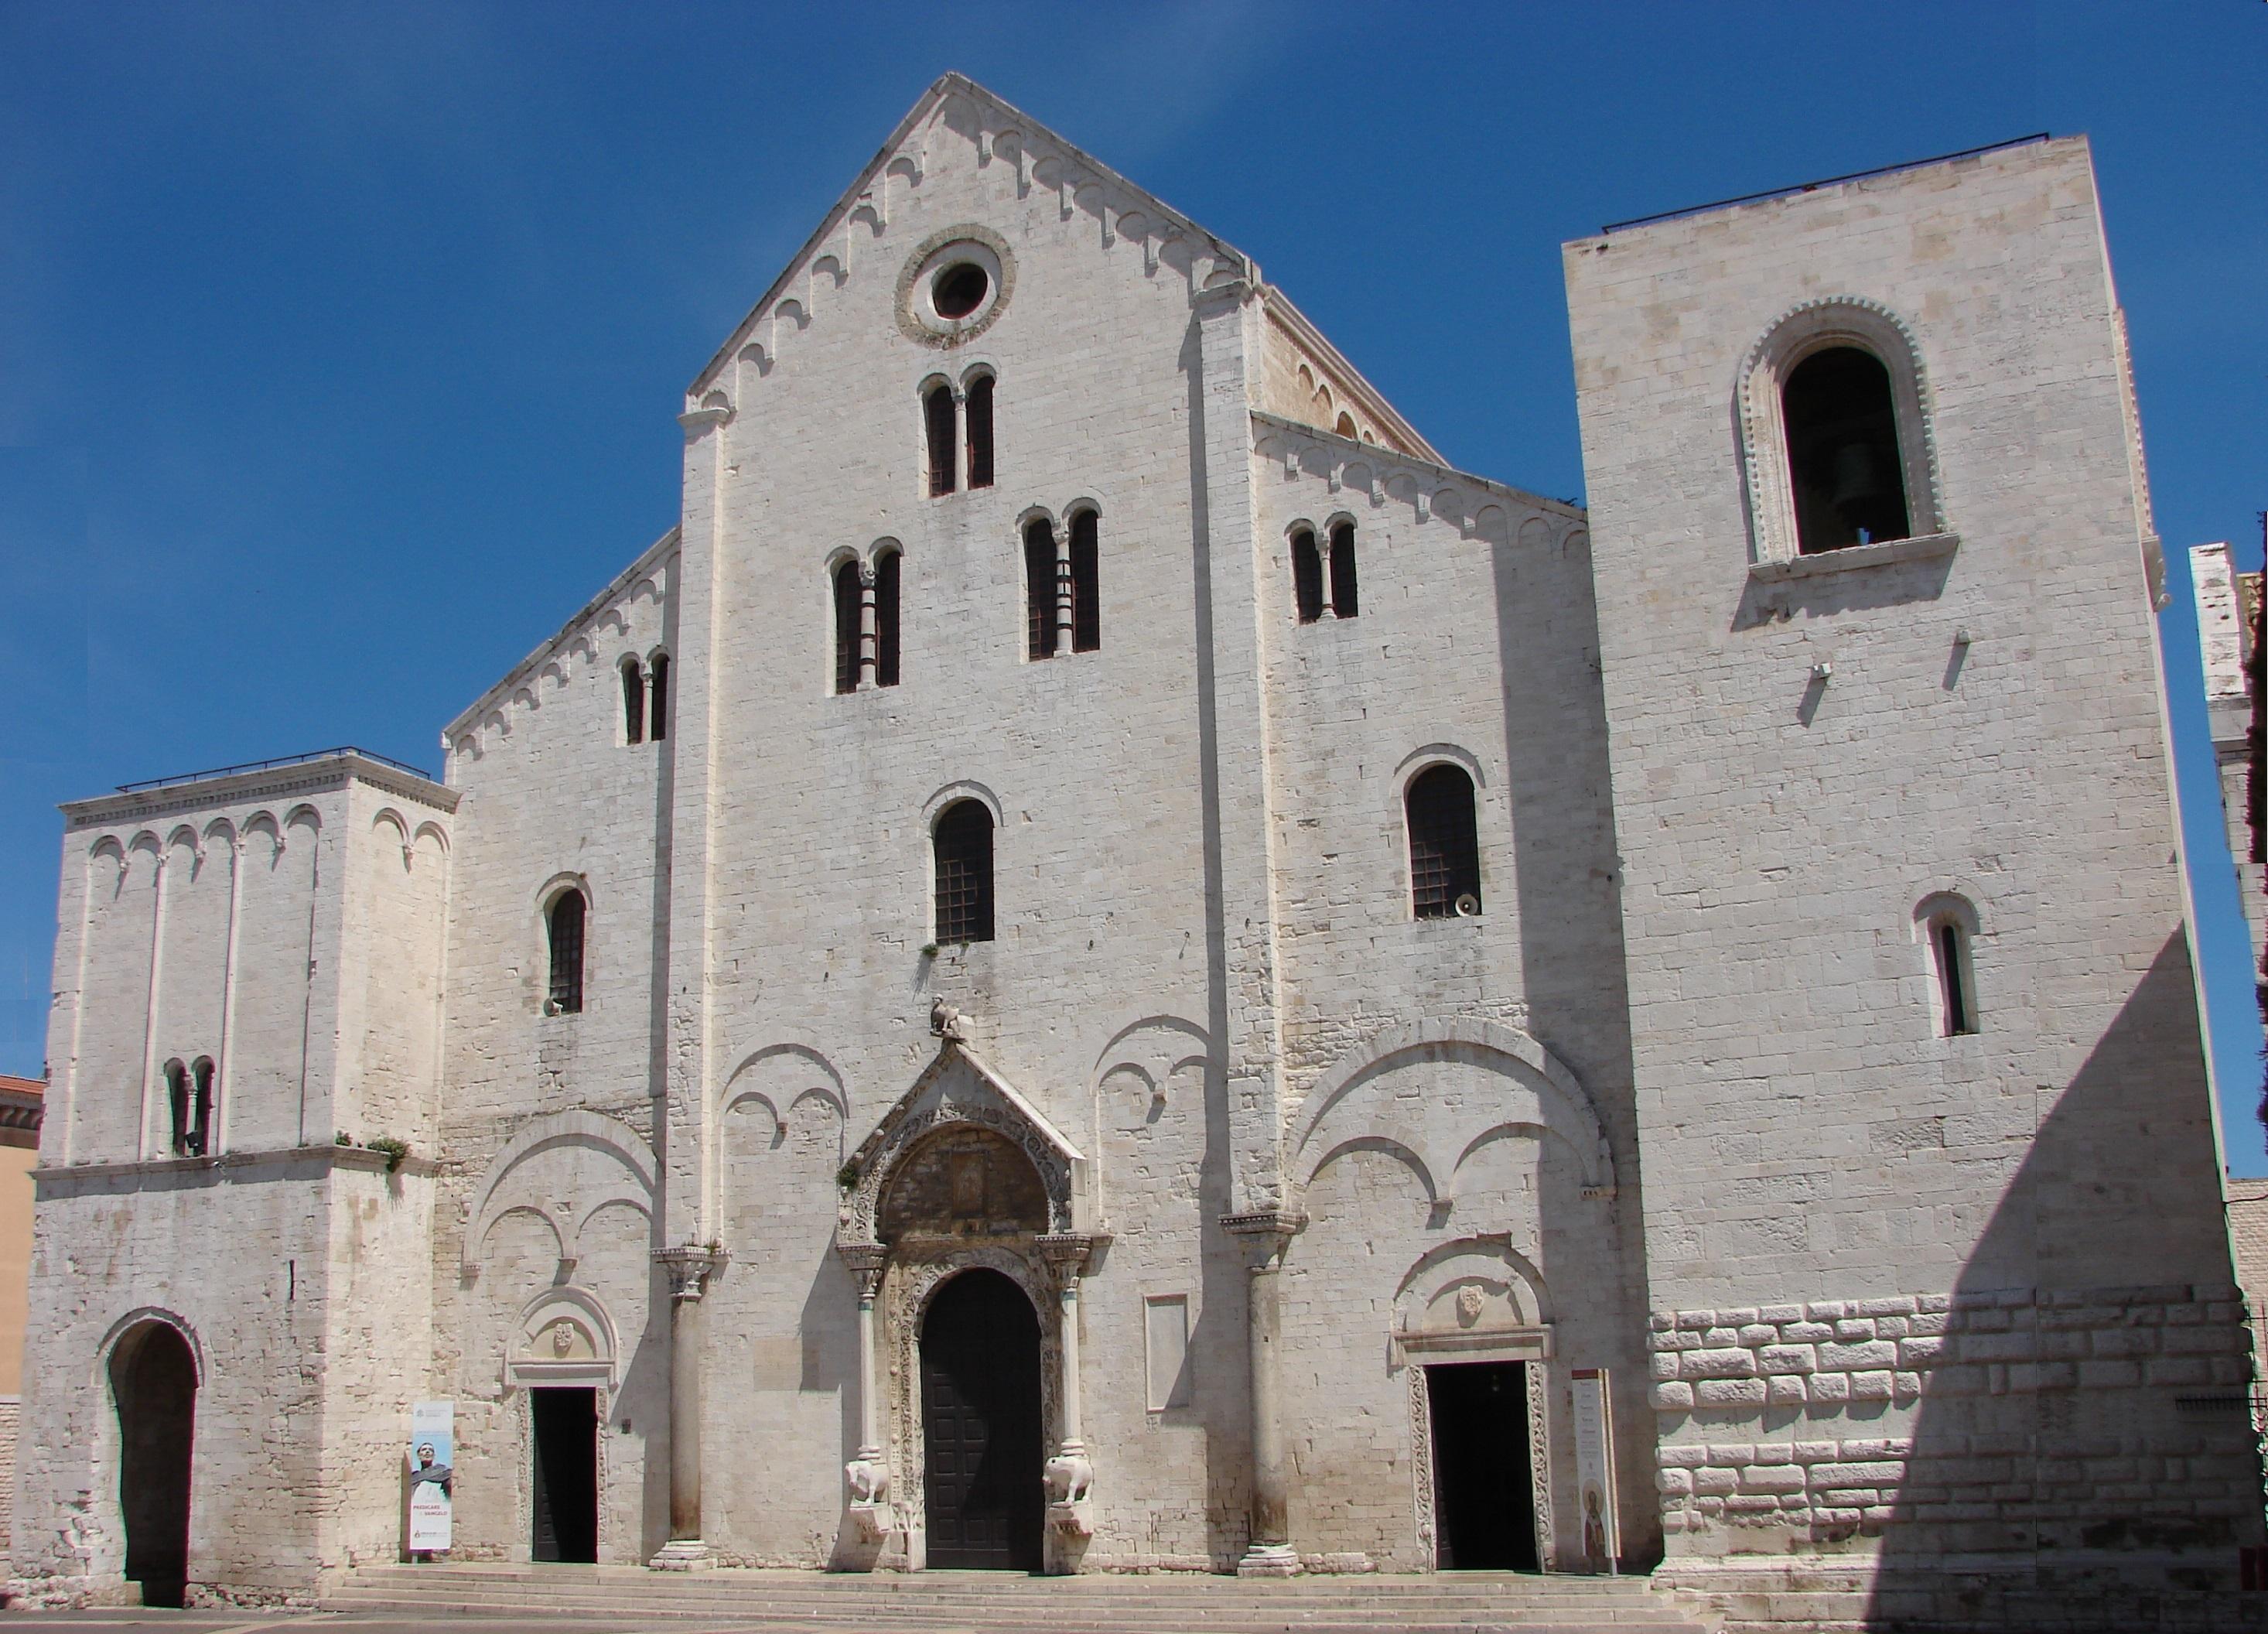 The Basilica of Bari by BricksandStones